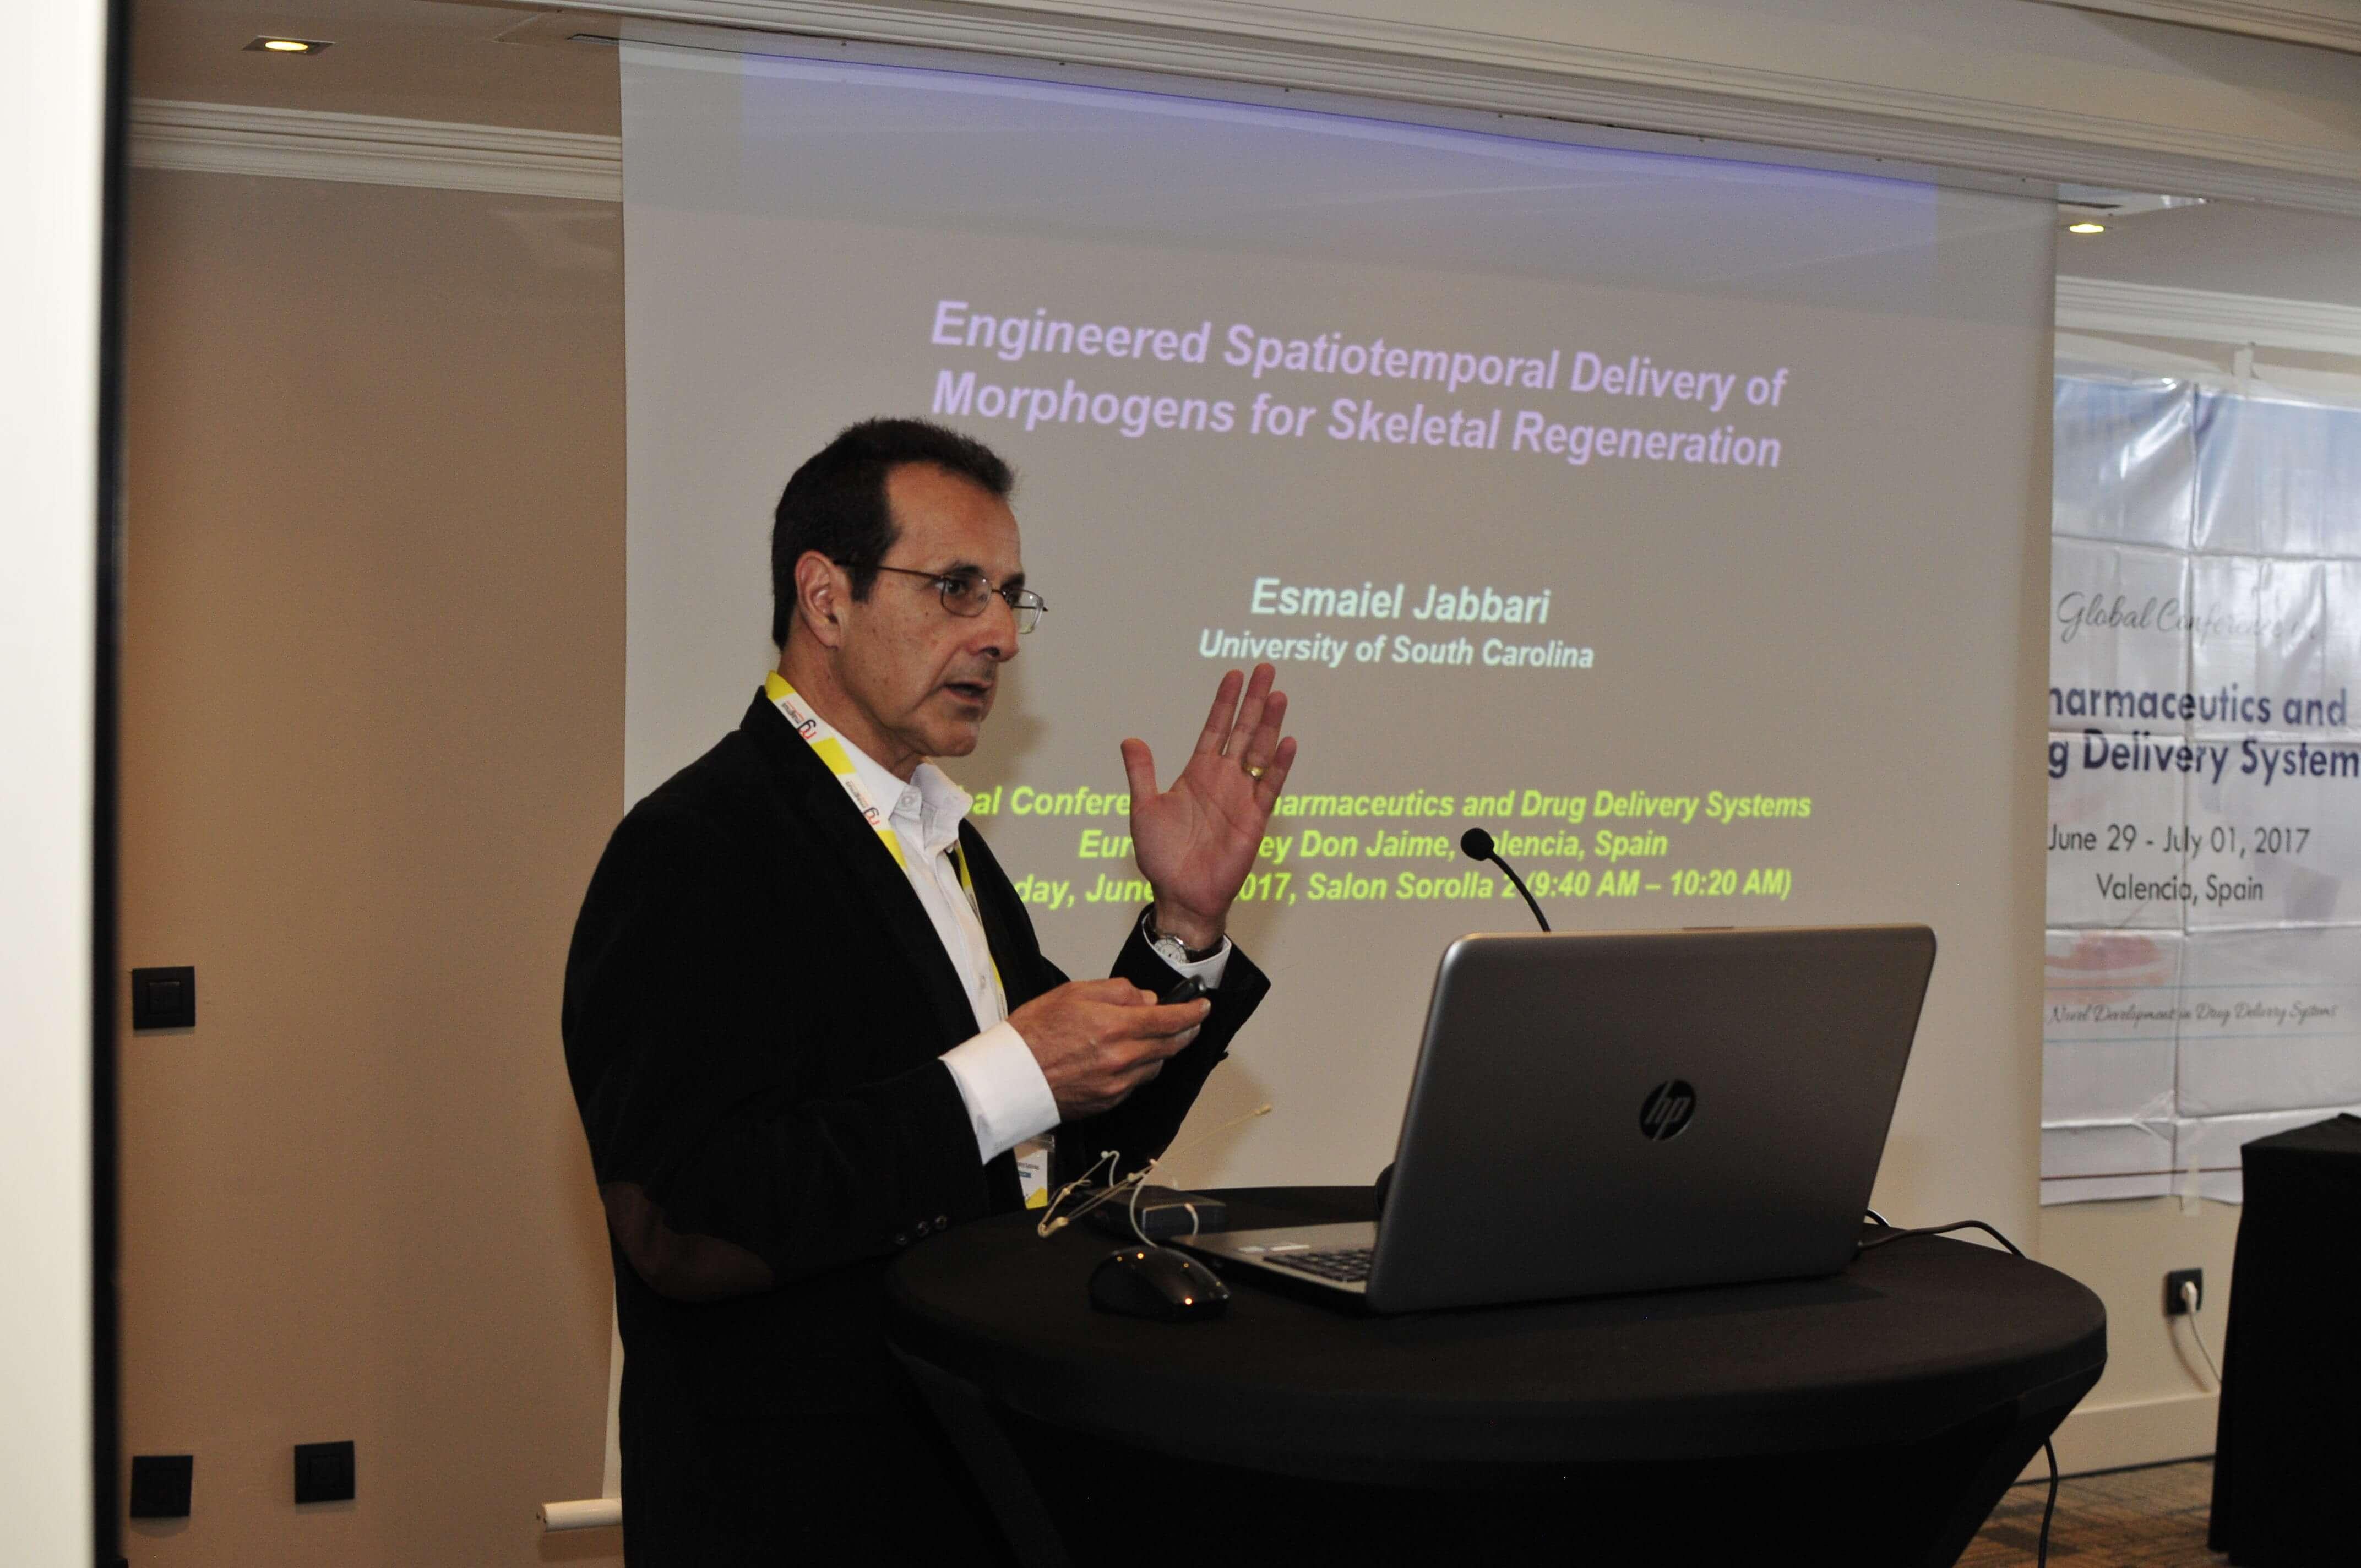 Leading speakers for Pharma Conferences 2020 -Esmaiel Jabbari